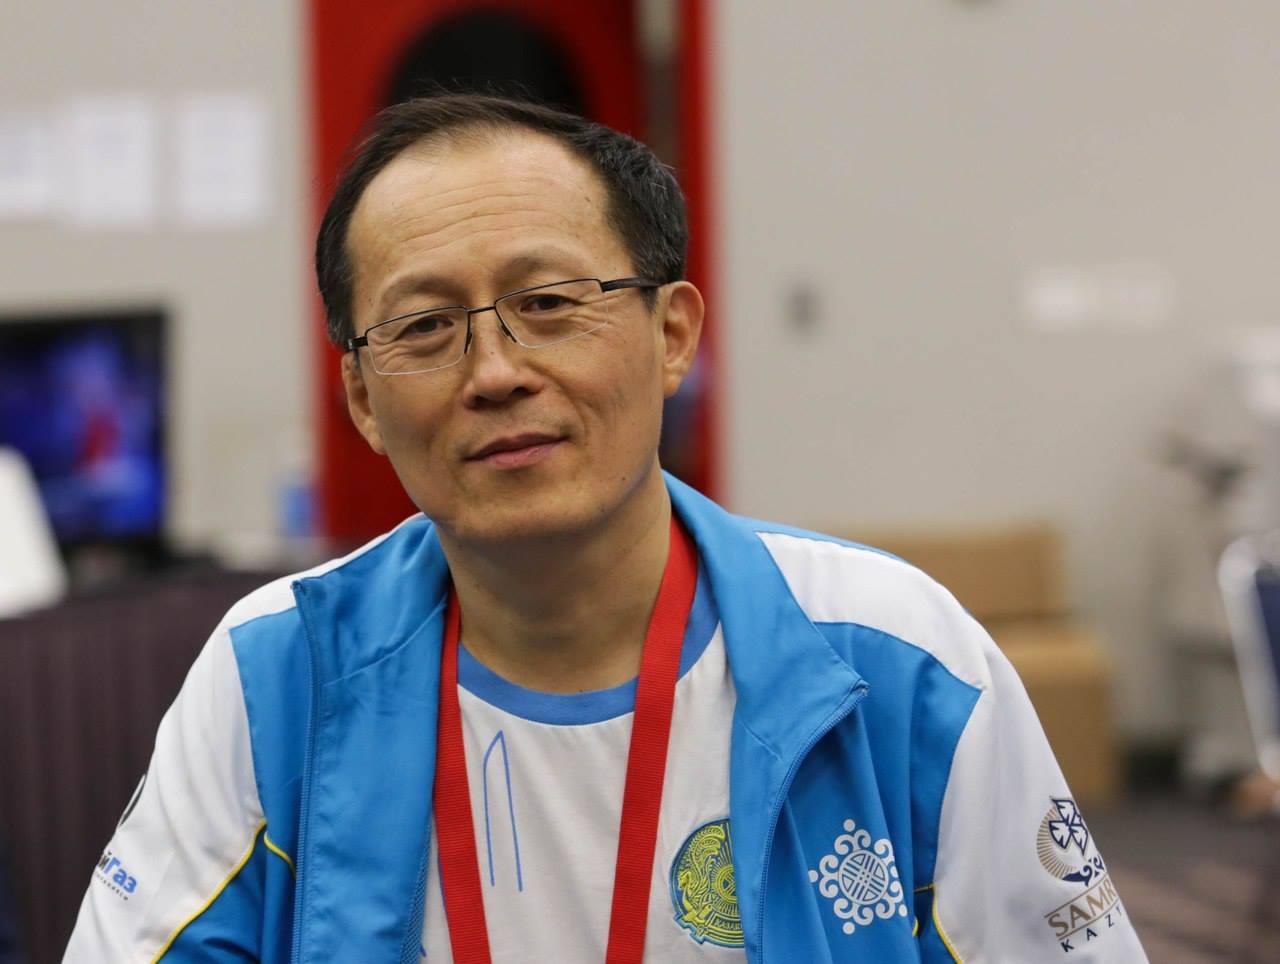 Aleksey Ni Steps Down As Head Coach of Kazakhstan's National Weightlifting Team - BarBend